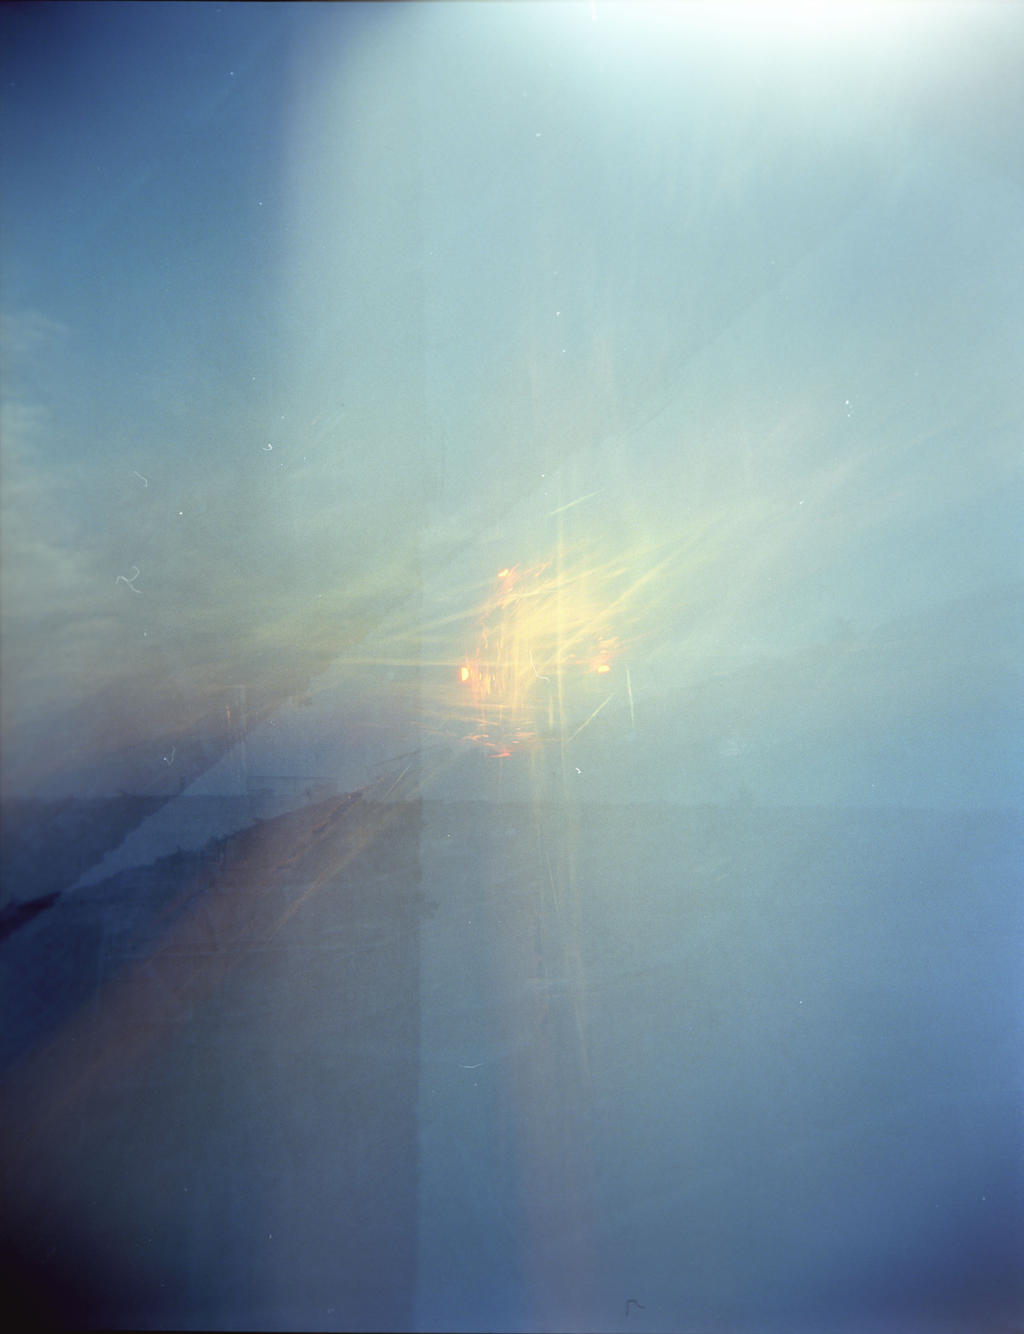 artificial sun by unevens